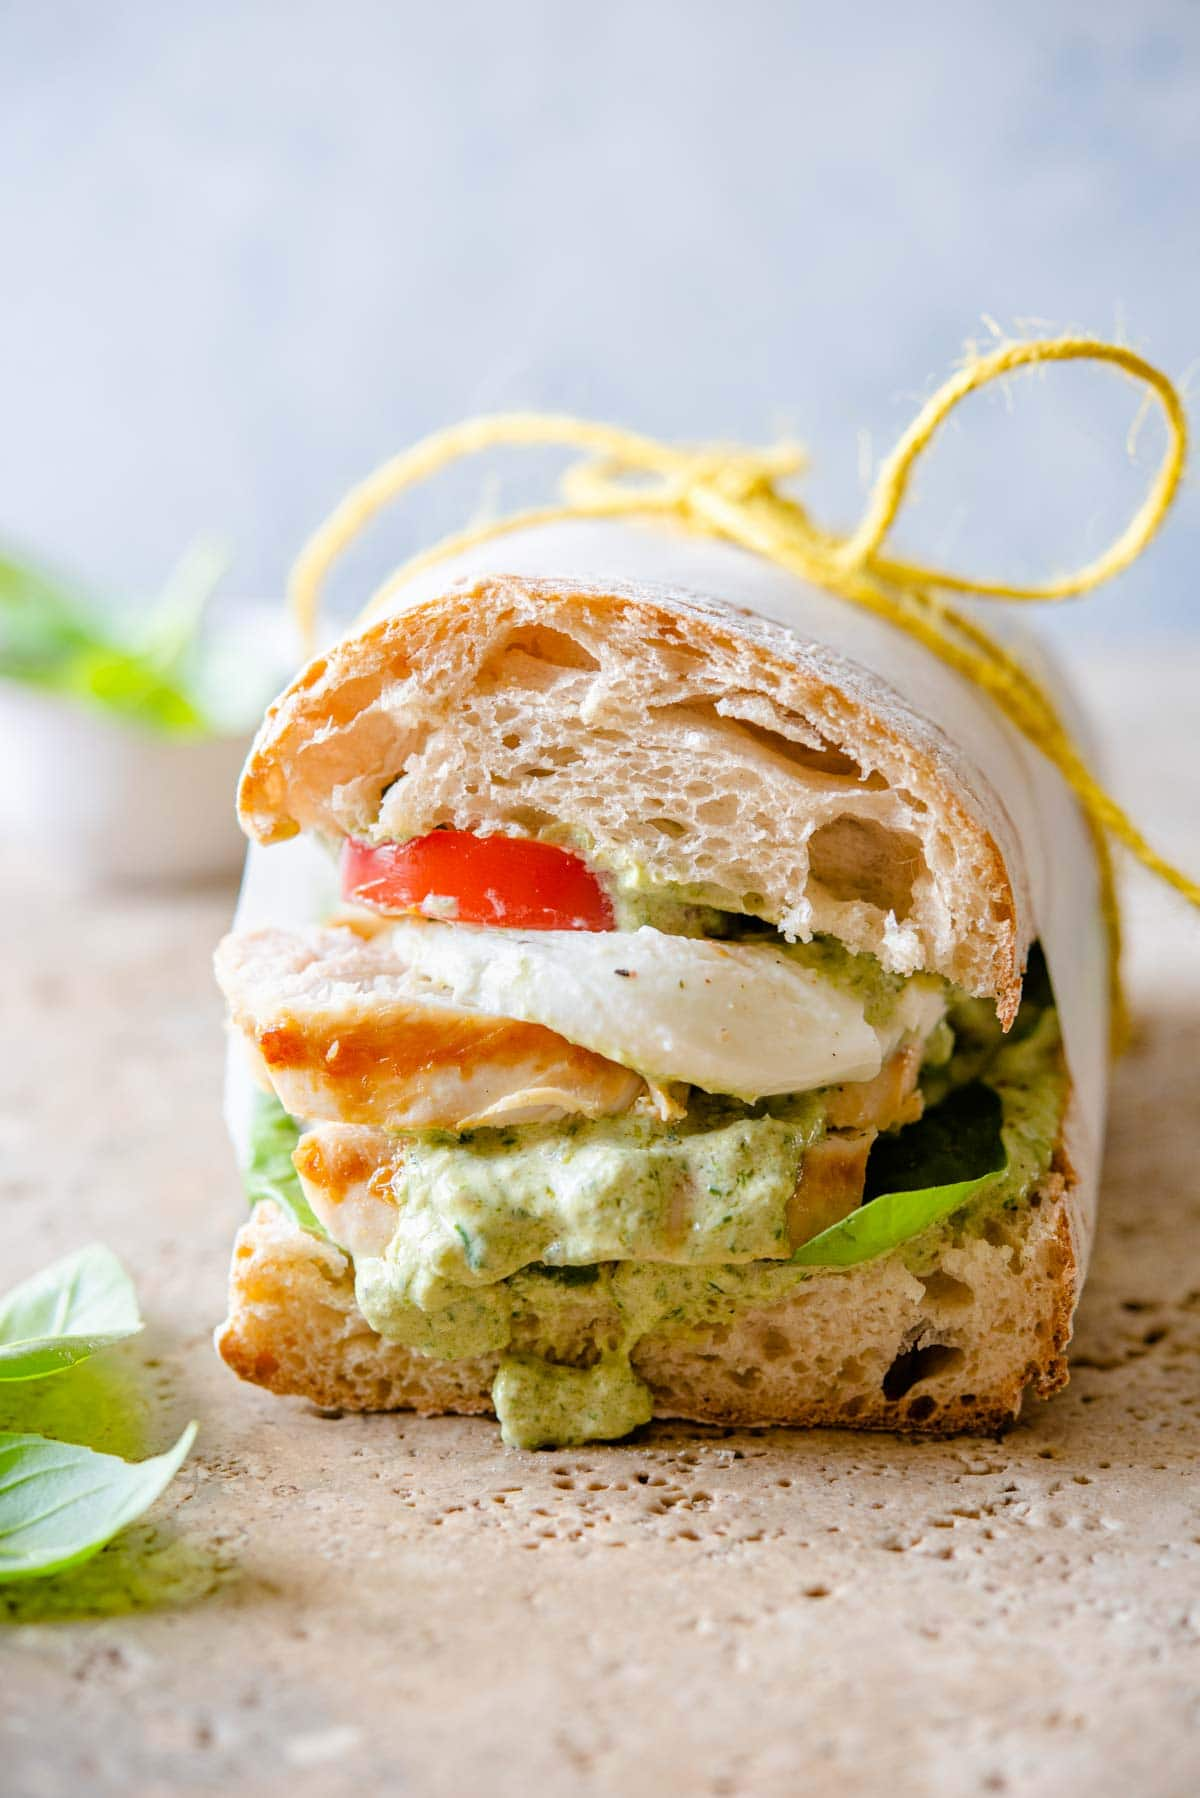 A close up of a chicken ciabatta sandwich with pesto